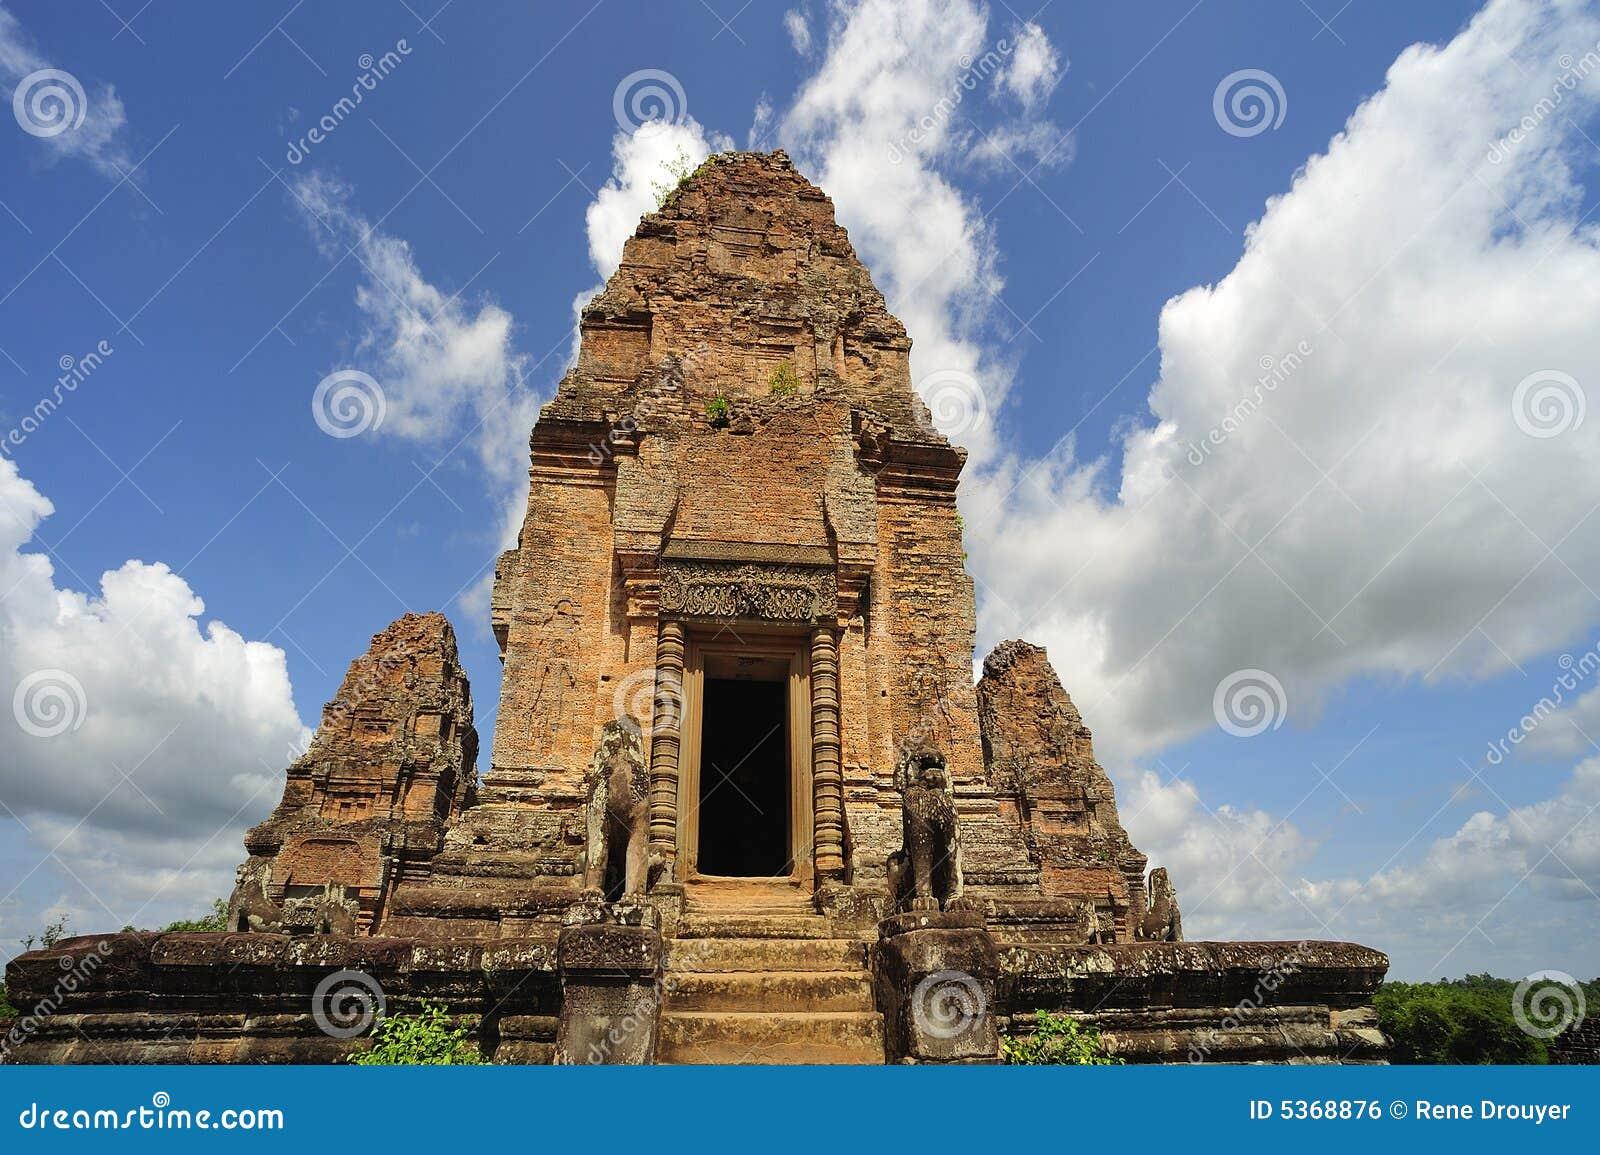 Cambodia Angkor East Mebon temple